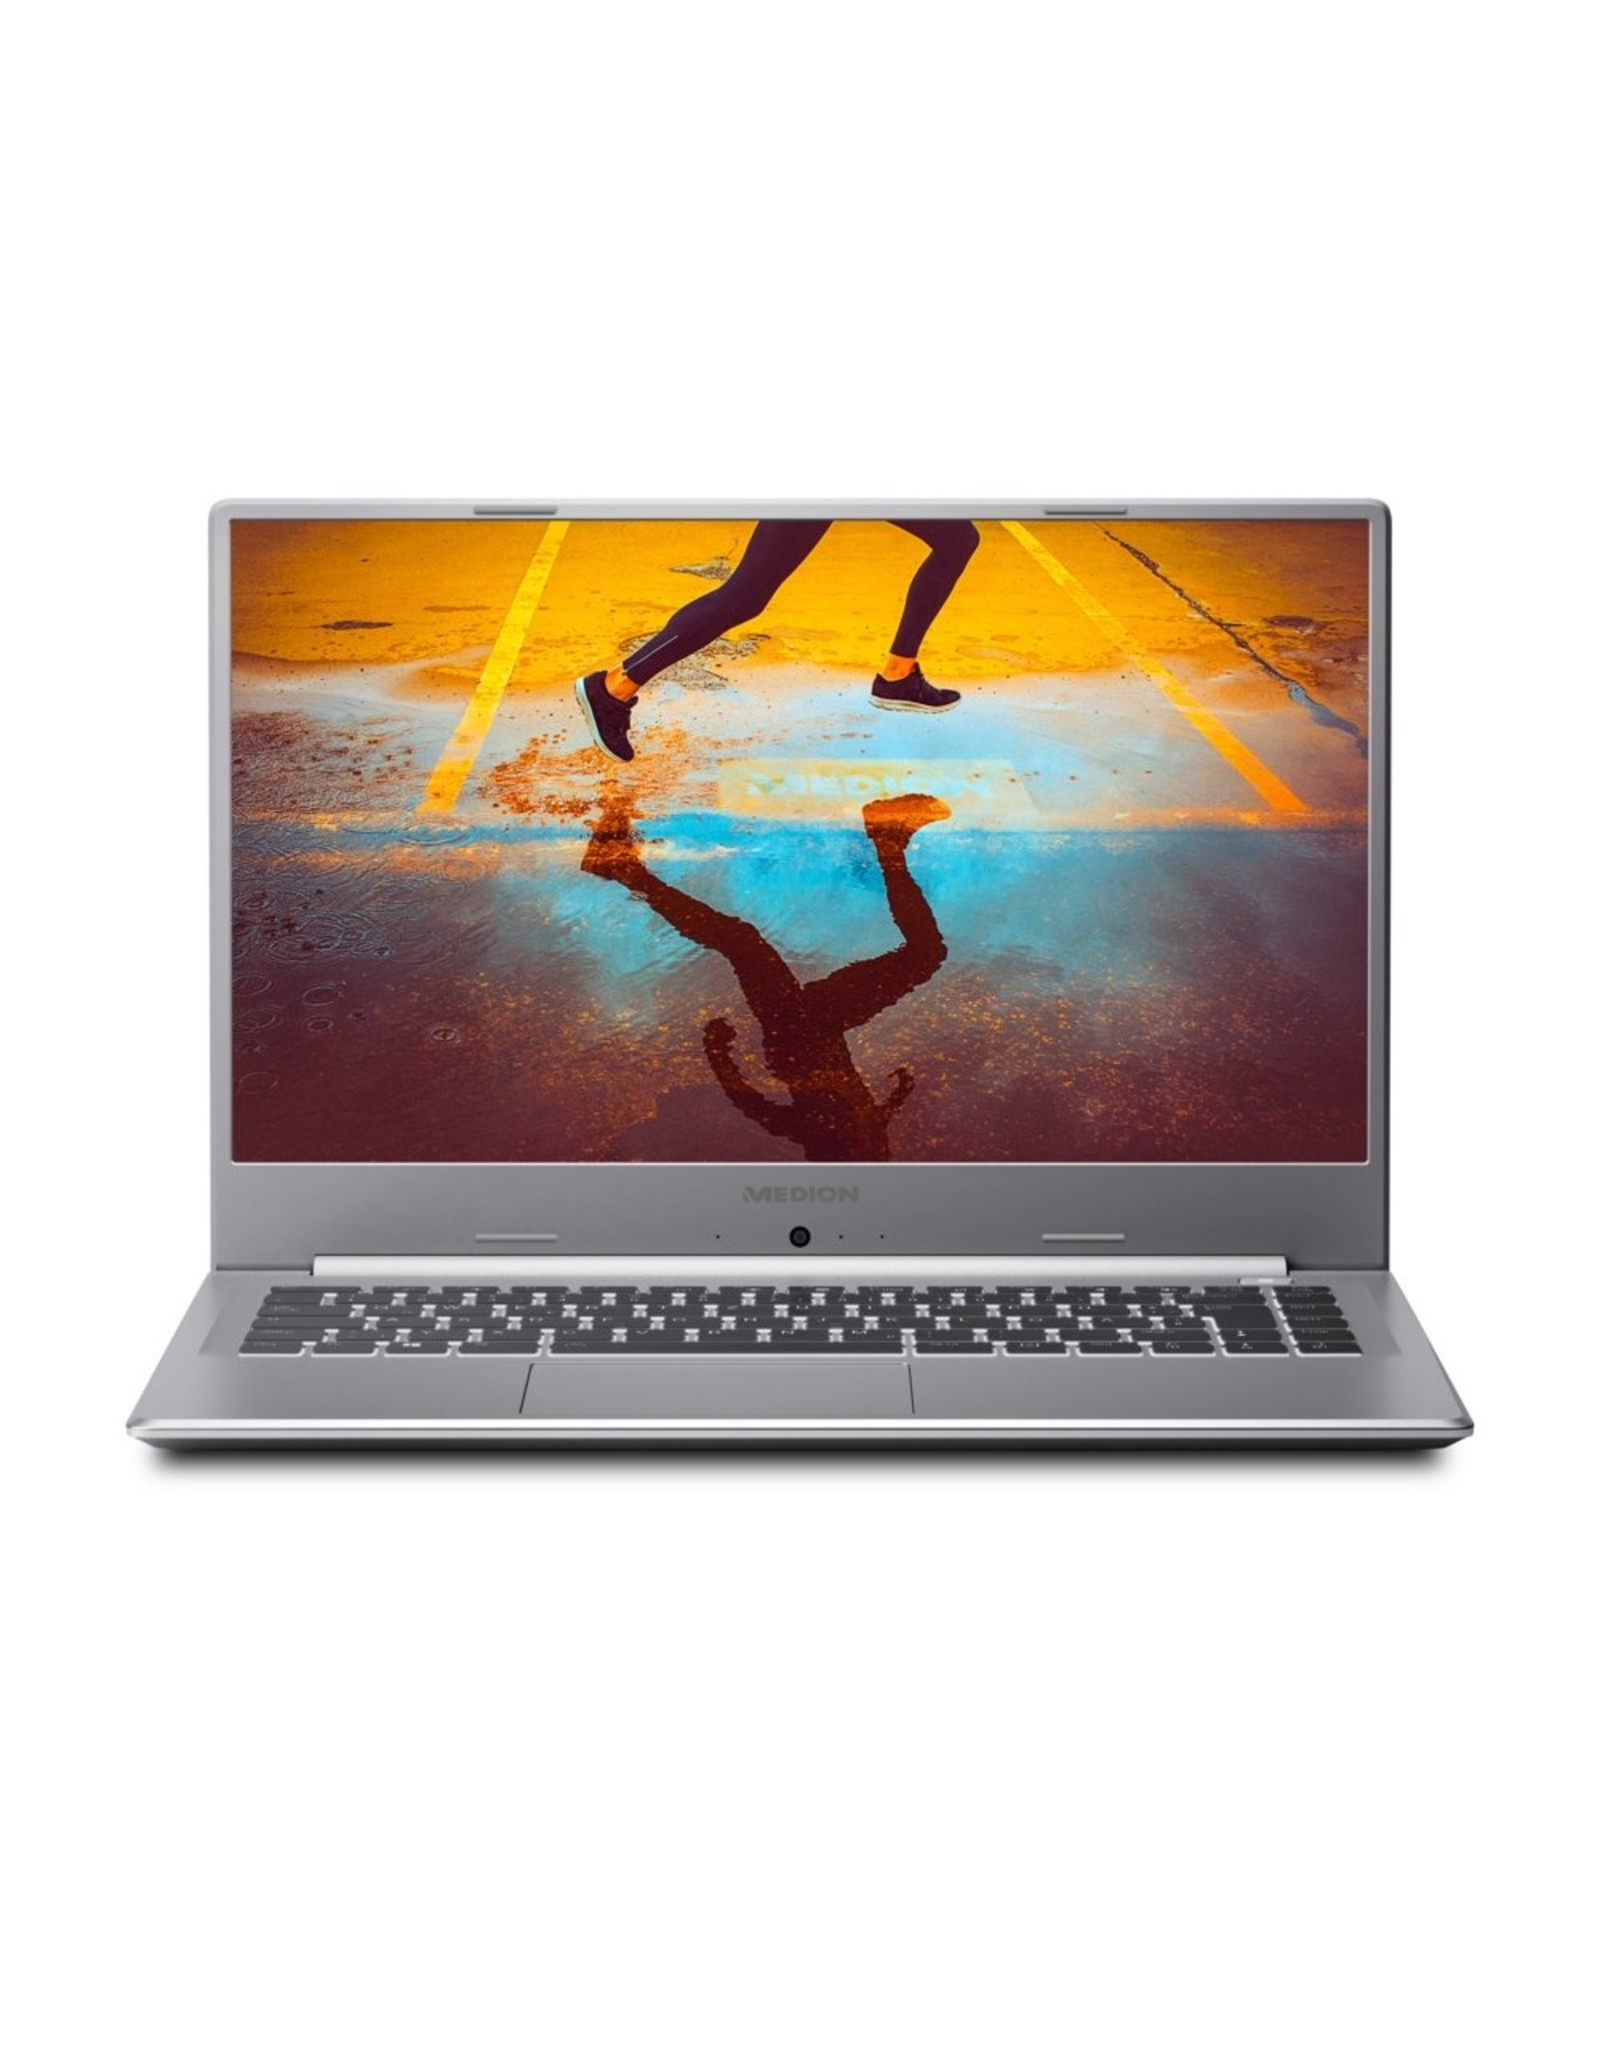 Medion MD61705 15.6 F-HD IPS i7-10510U / 16GB / 512GB / W10H